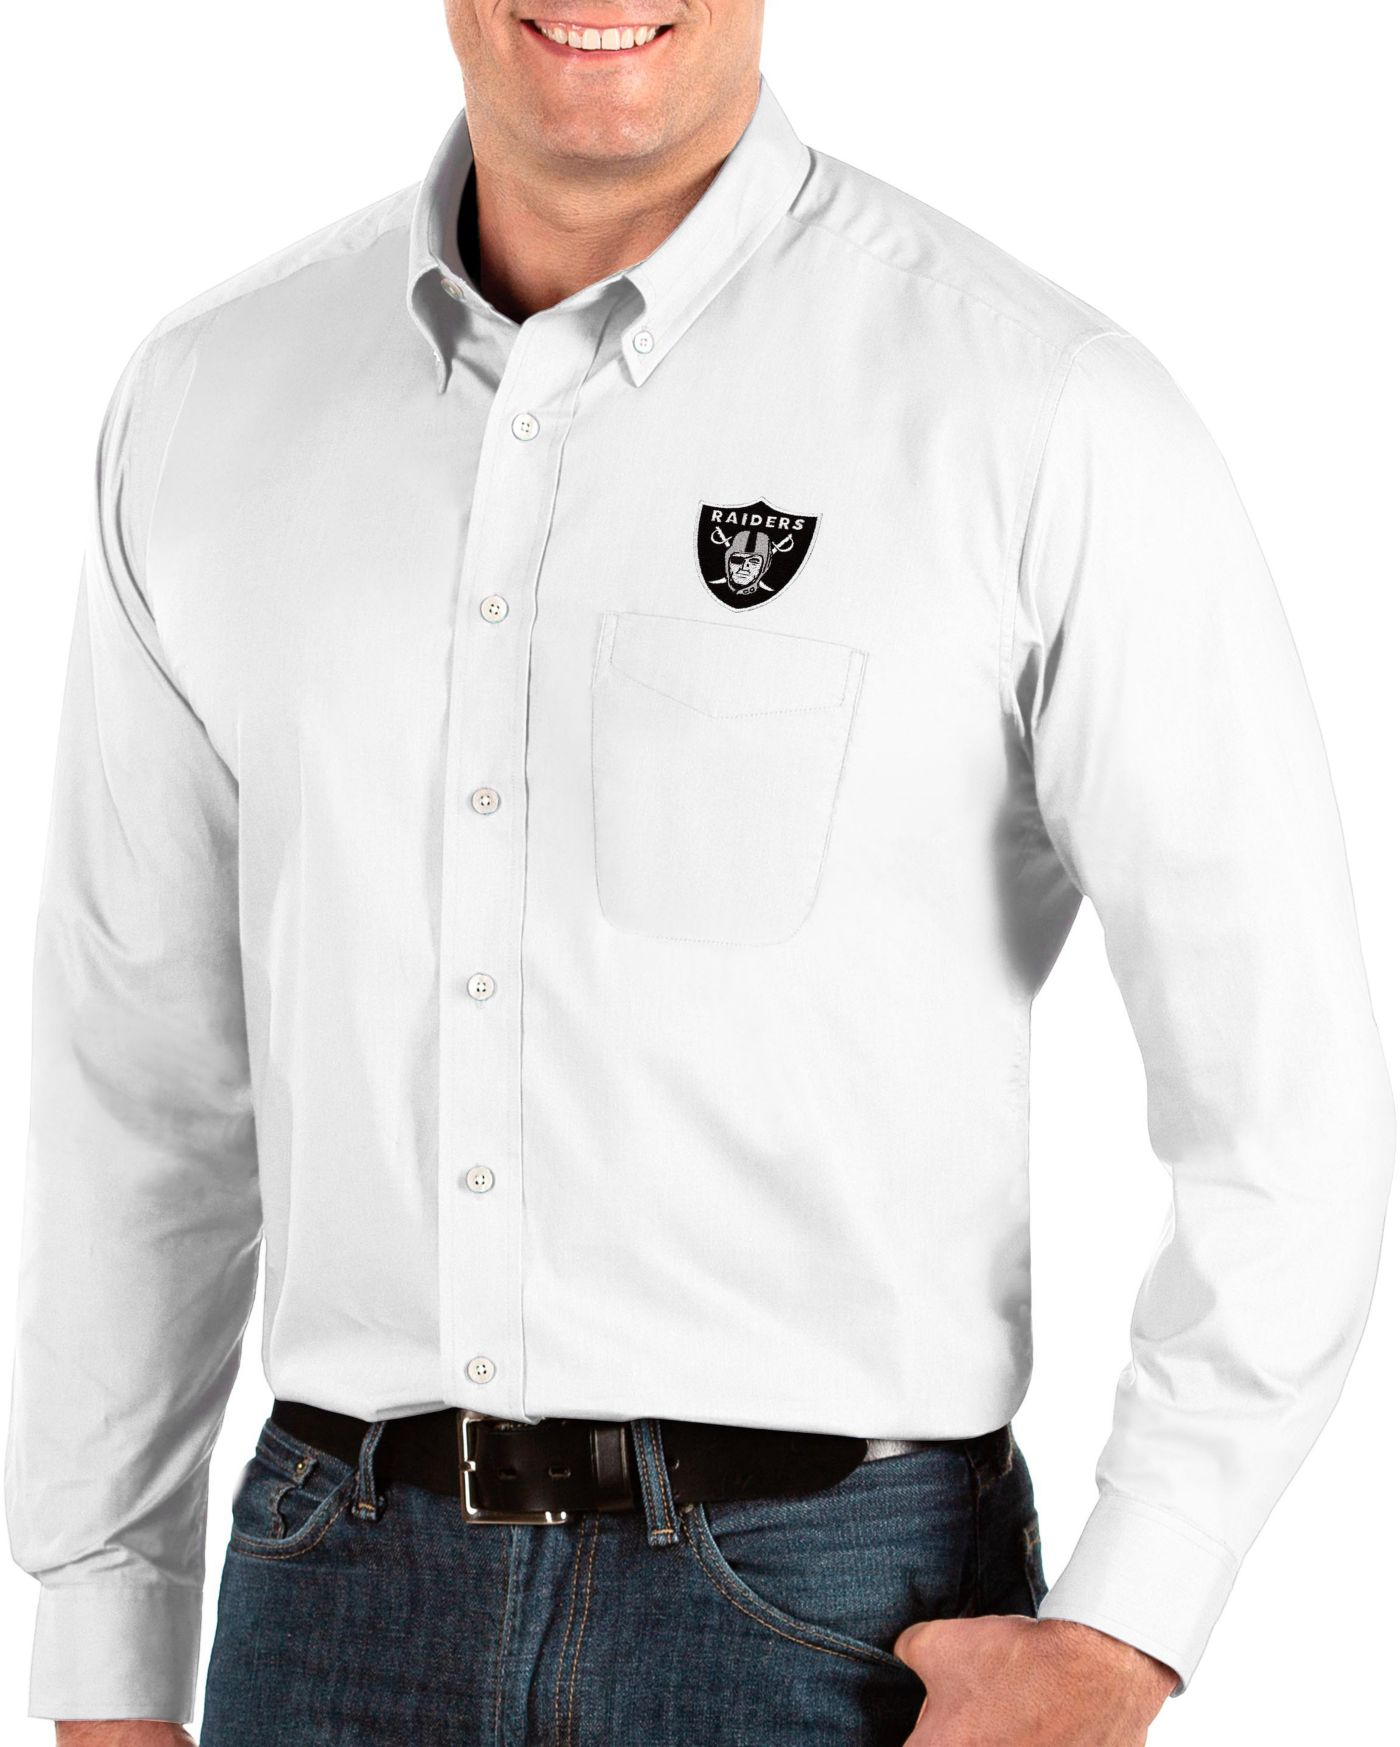 Antigua Men's Oakland Raiders Dynasty Button Down White Dress Shirt